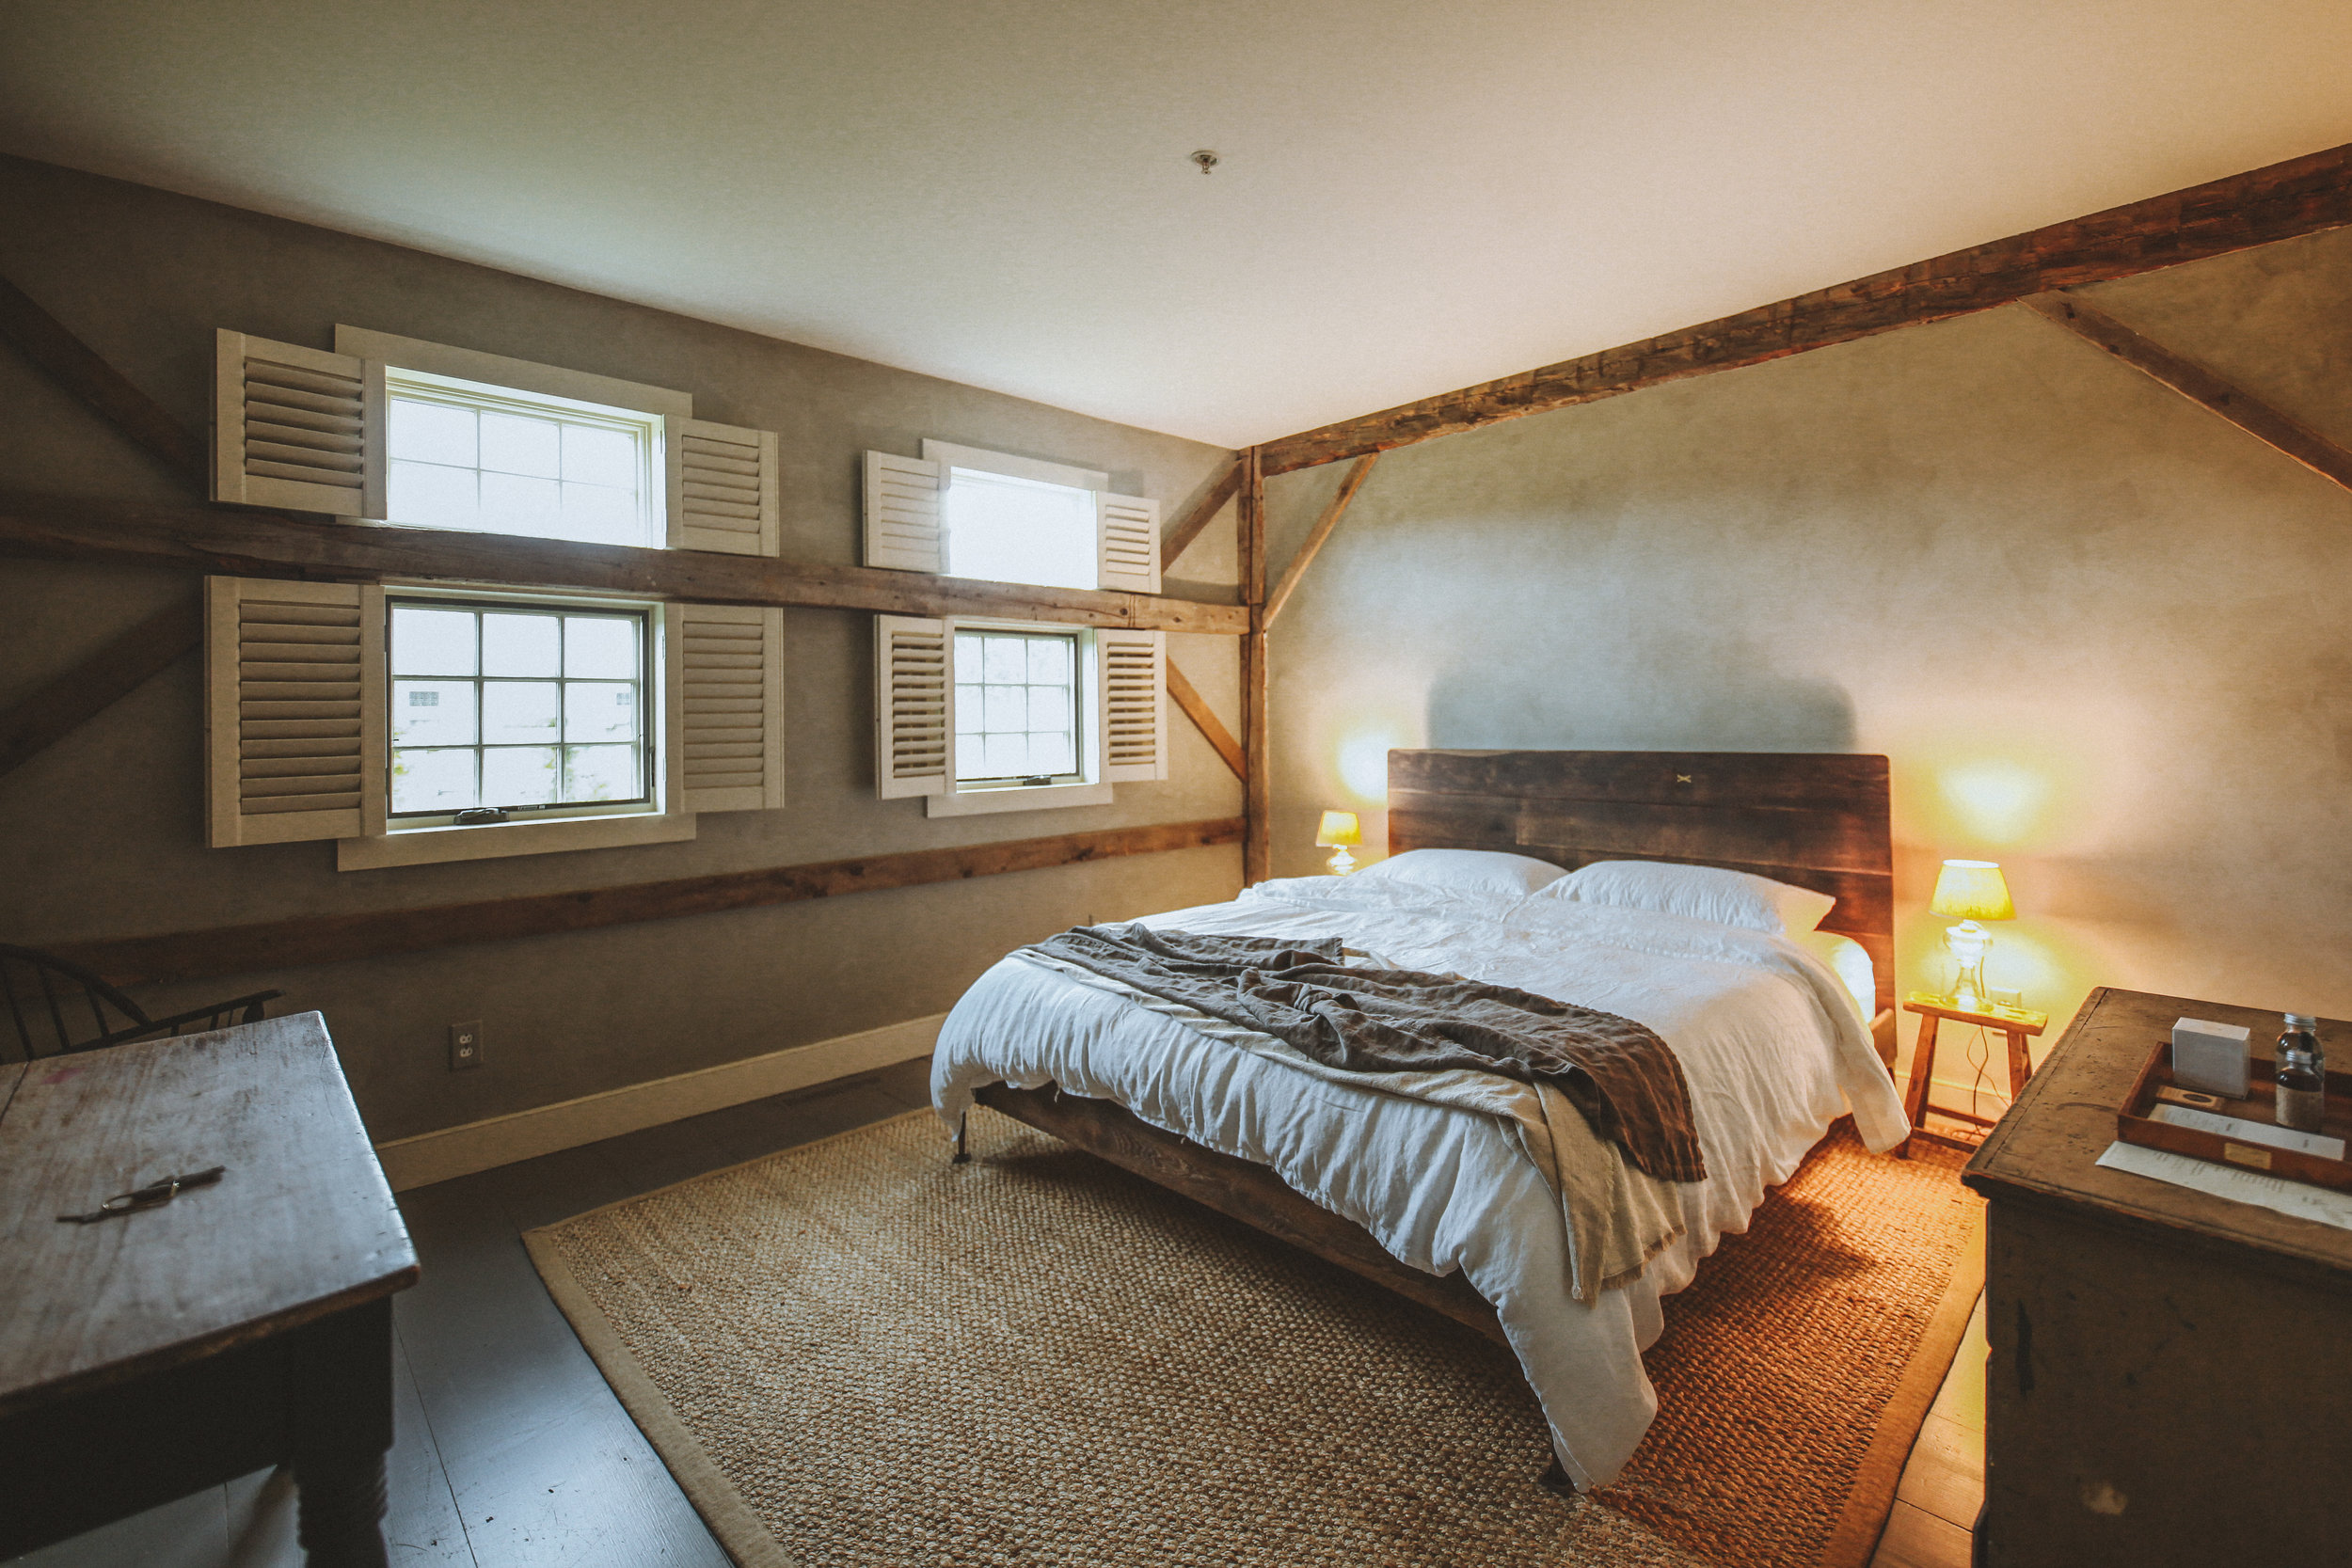 a_secret_hotel_interiors-6.jpg